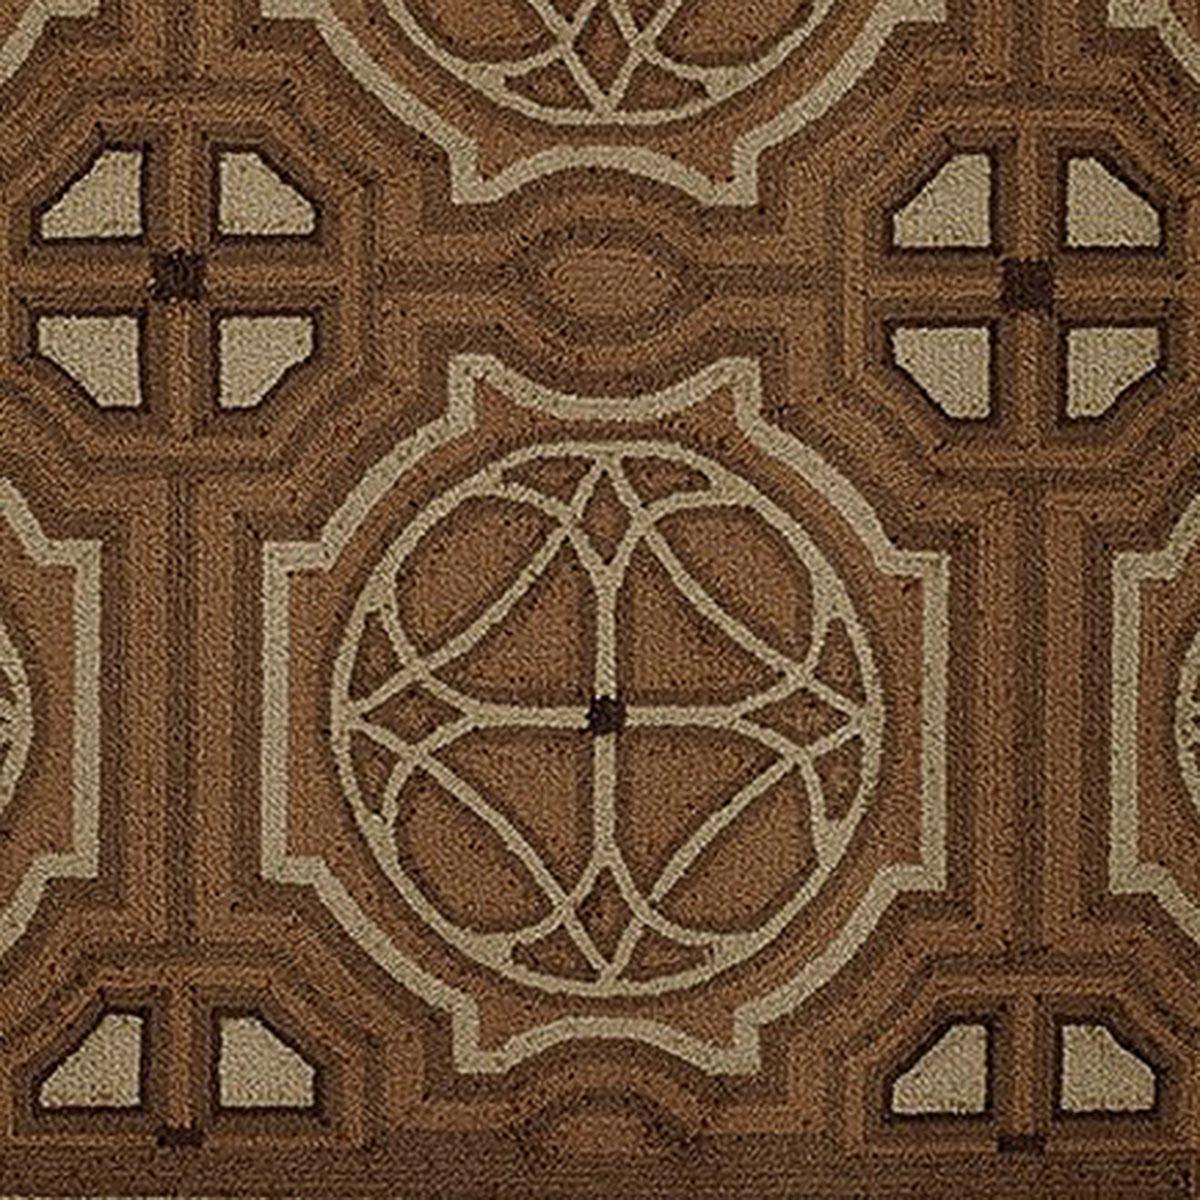 warren_wool_mixed-texture_patterson-flynn-martin_pfm